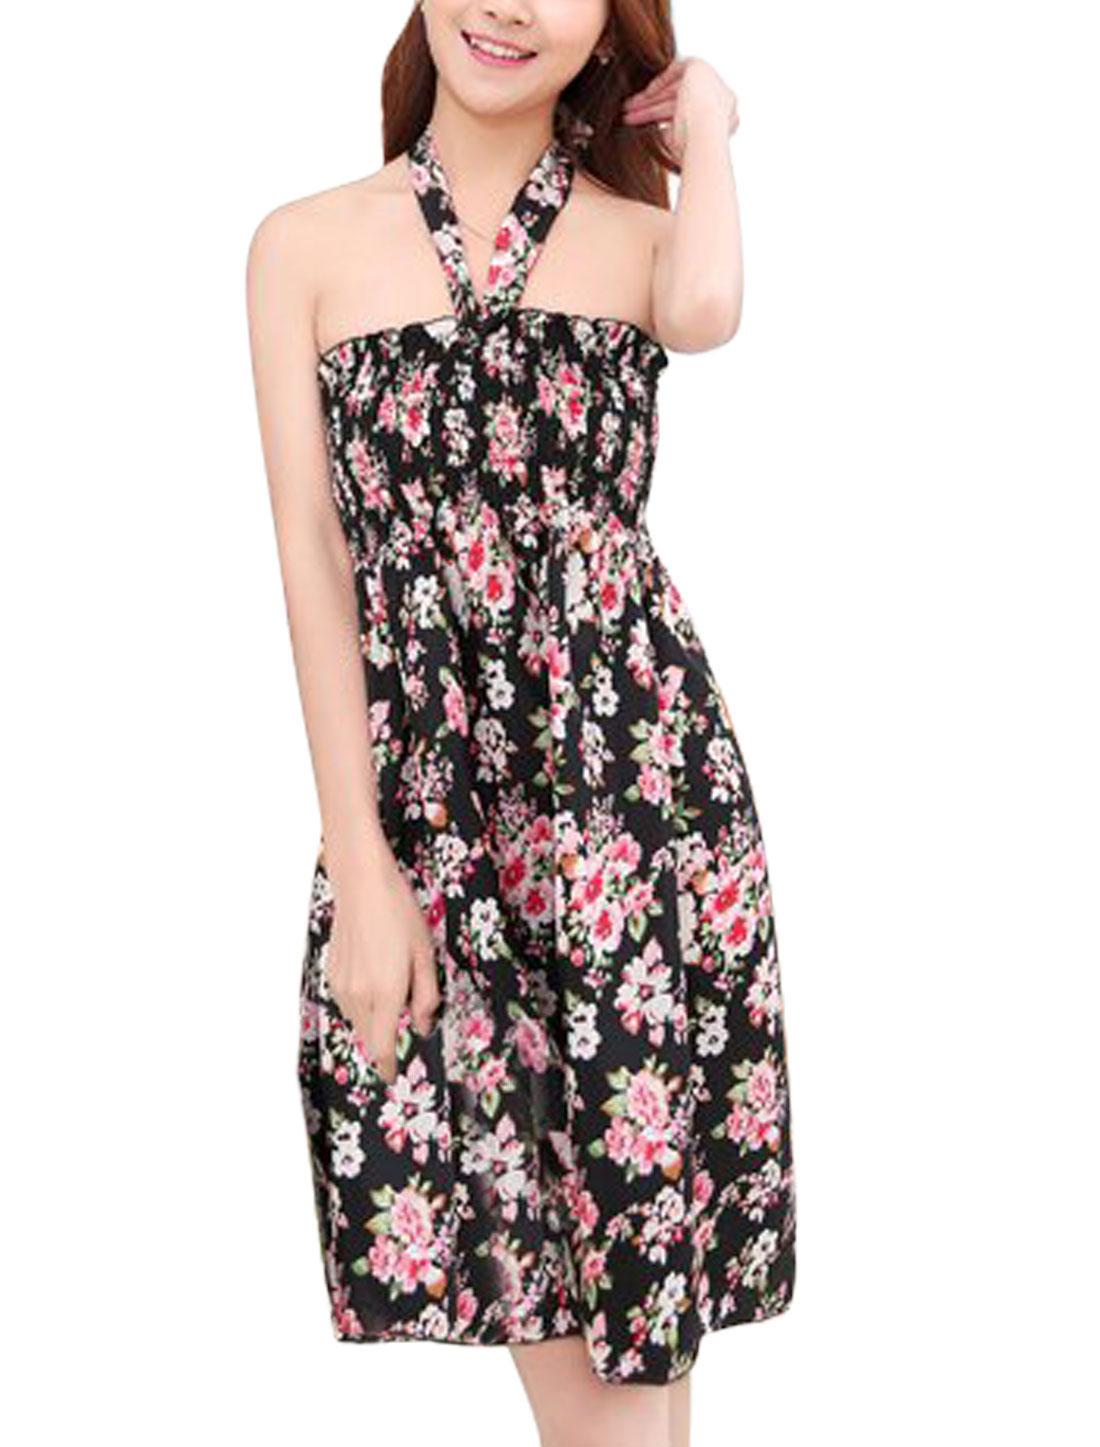 Woman Flroal Prints Smocking Bust Slipover Sleeveless A Line Dress Black S